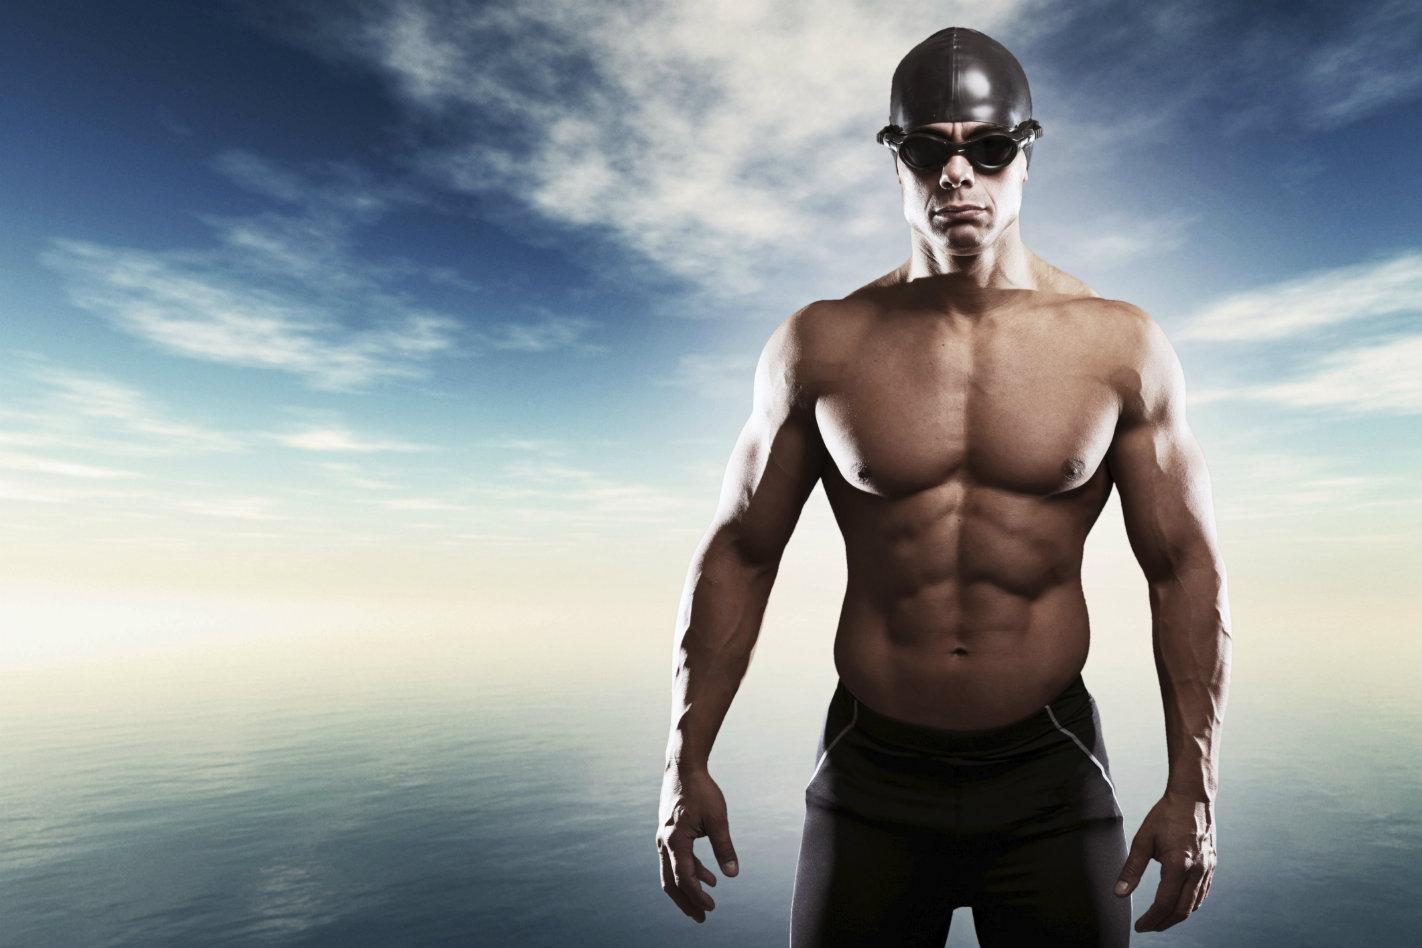 Running, Vélo, Natation : Quel Sport Choisir Pour Garder La ... dedans Musculation Piscine